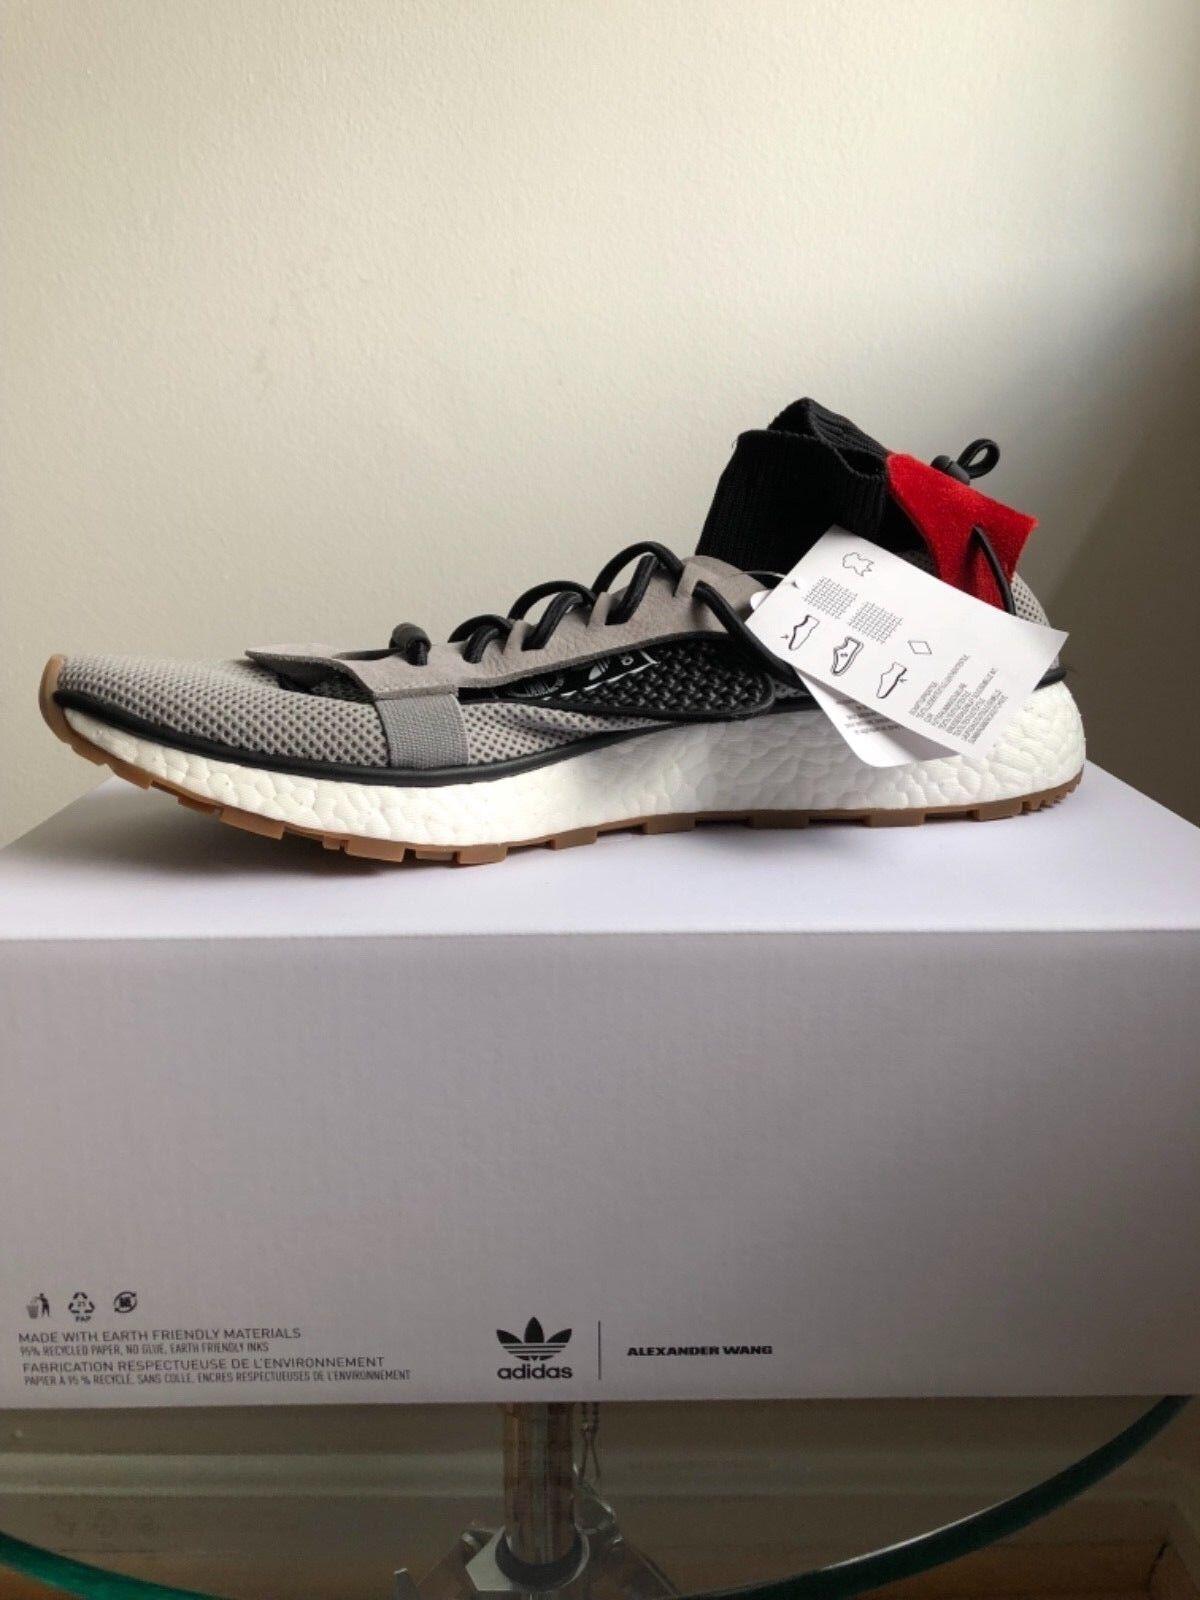 AW Run size 11 Grey Red Gum. Adidas X Alexander Wang CM7826 ultra boost NMD